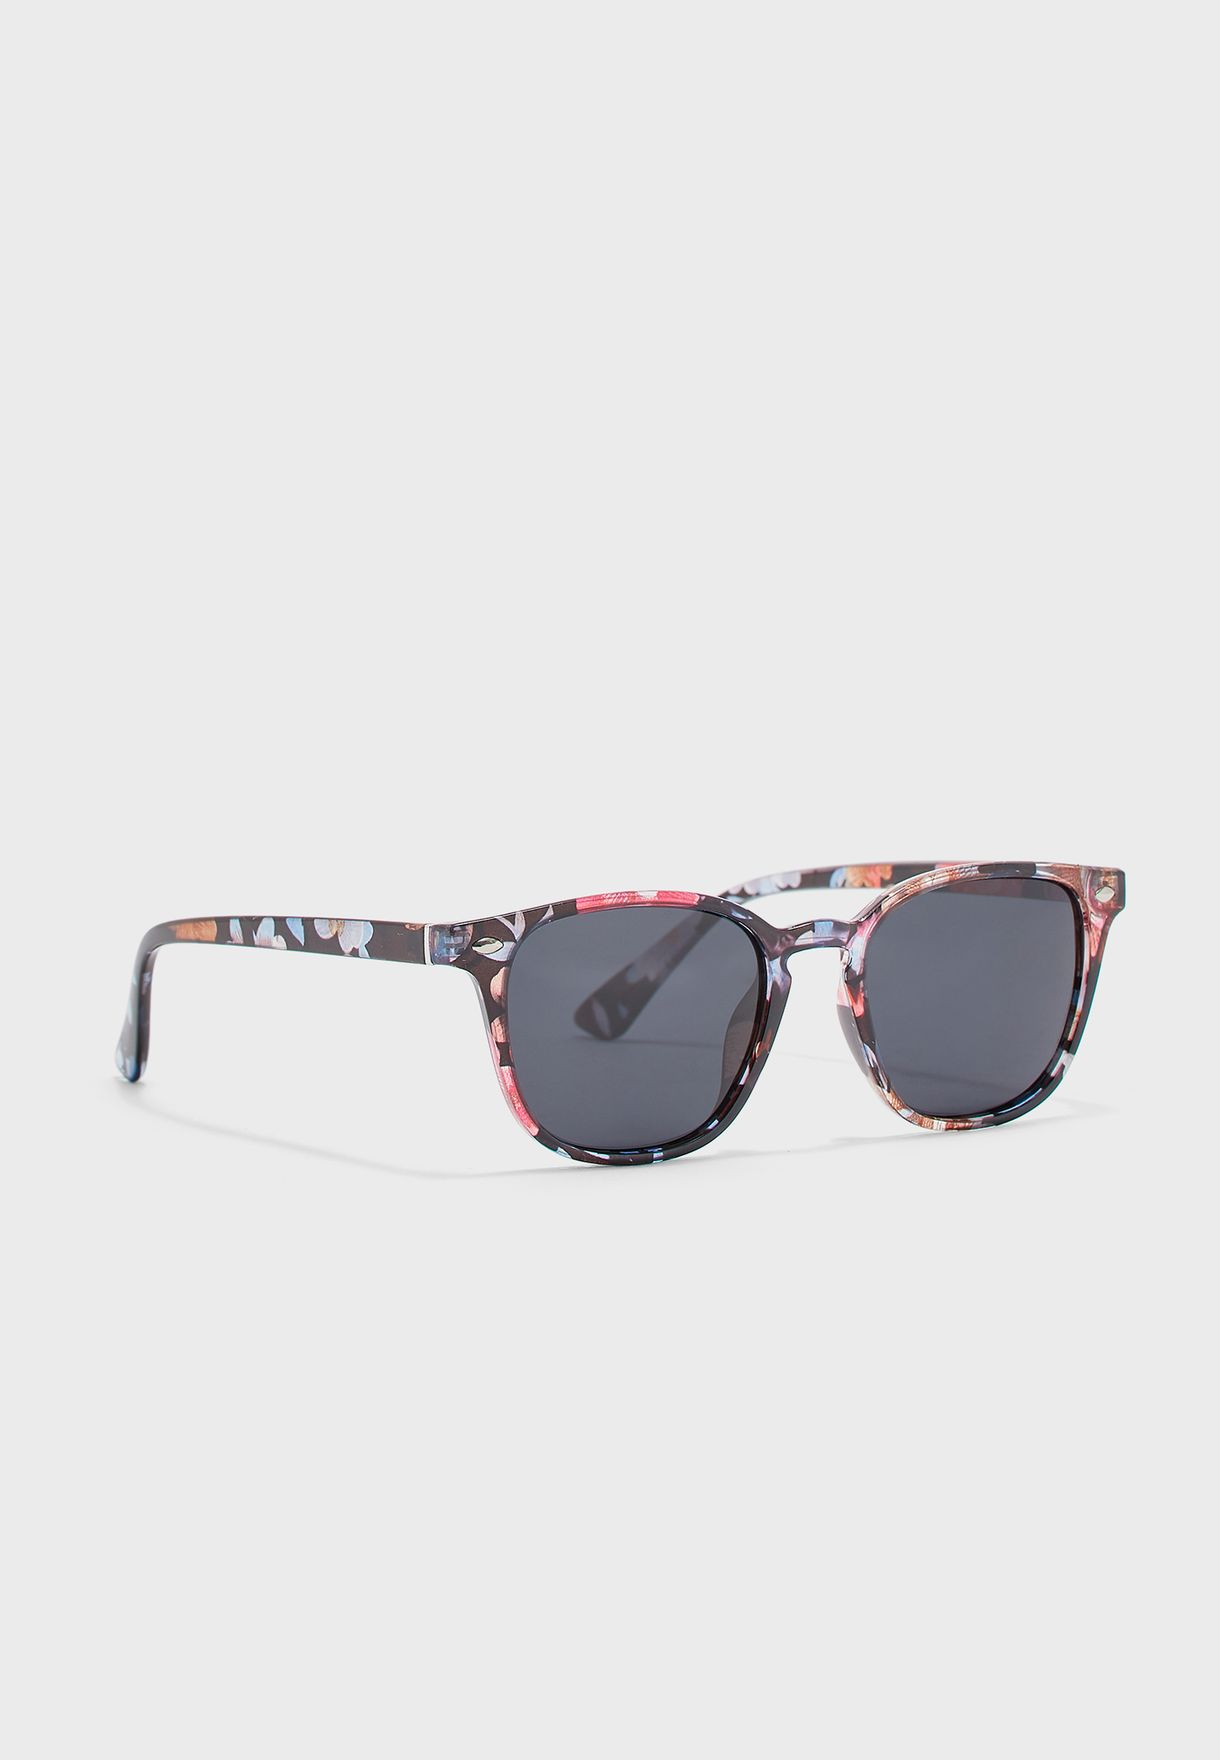 Floral Print Polarized Wayfarer Sunglasses